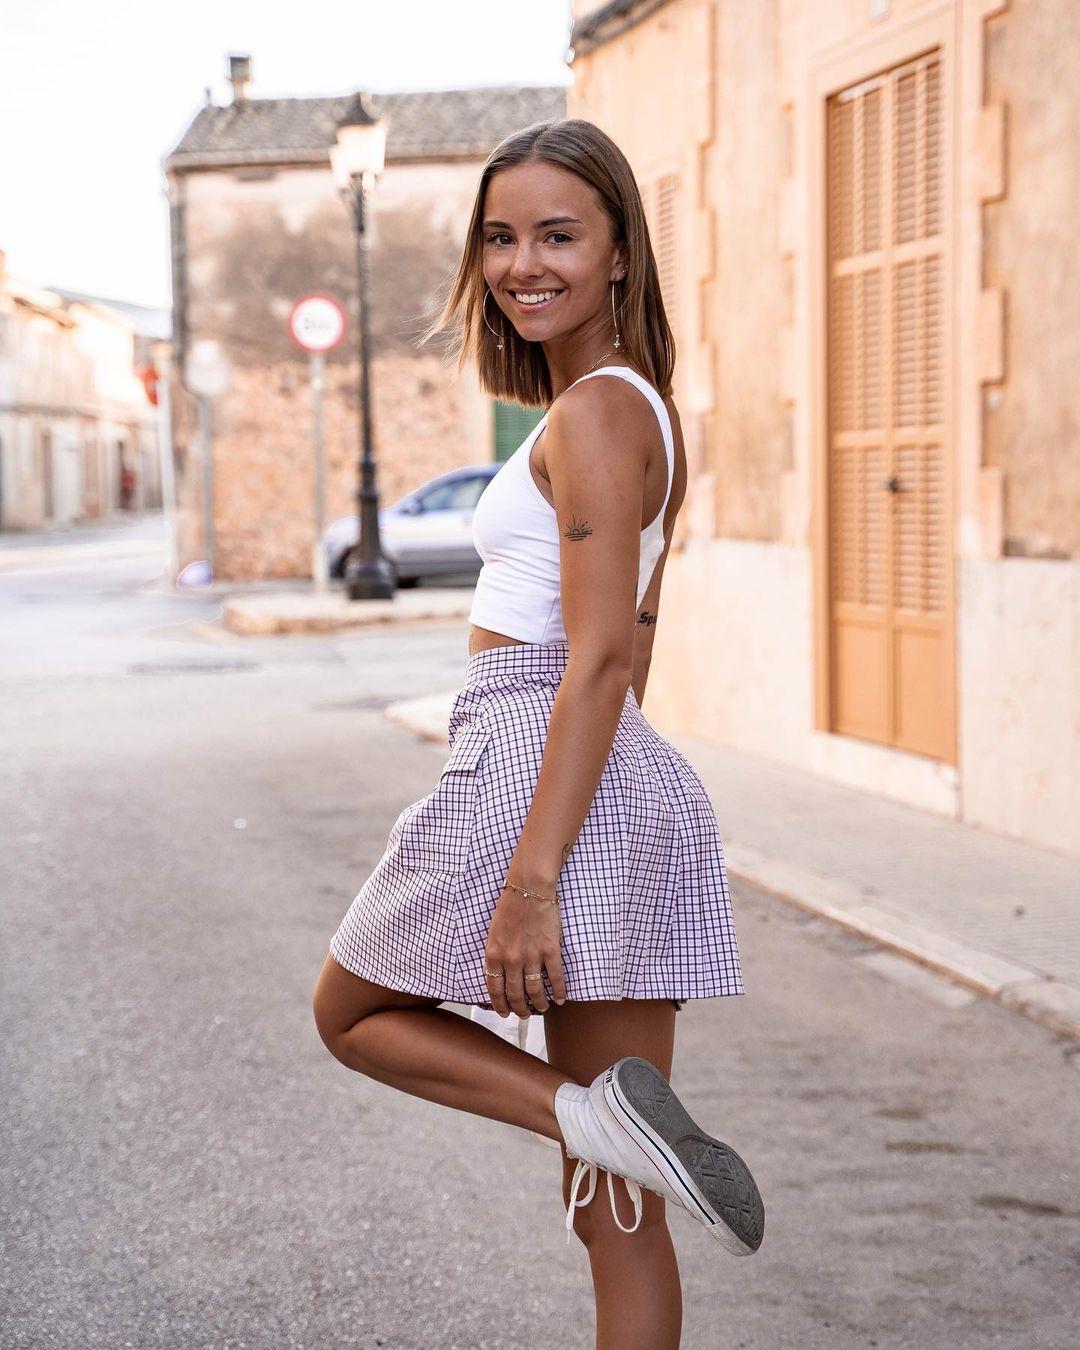 Hannah-Carolina-Wallpapers-Insta-Fit-Bio-15